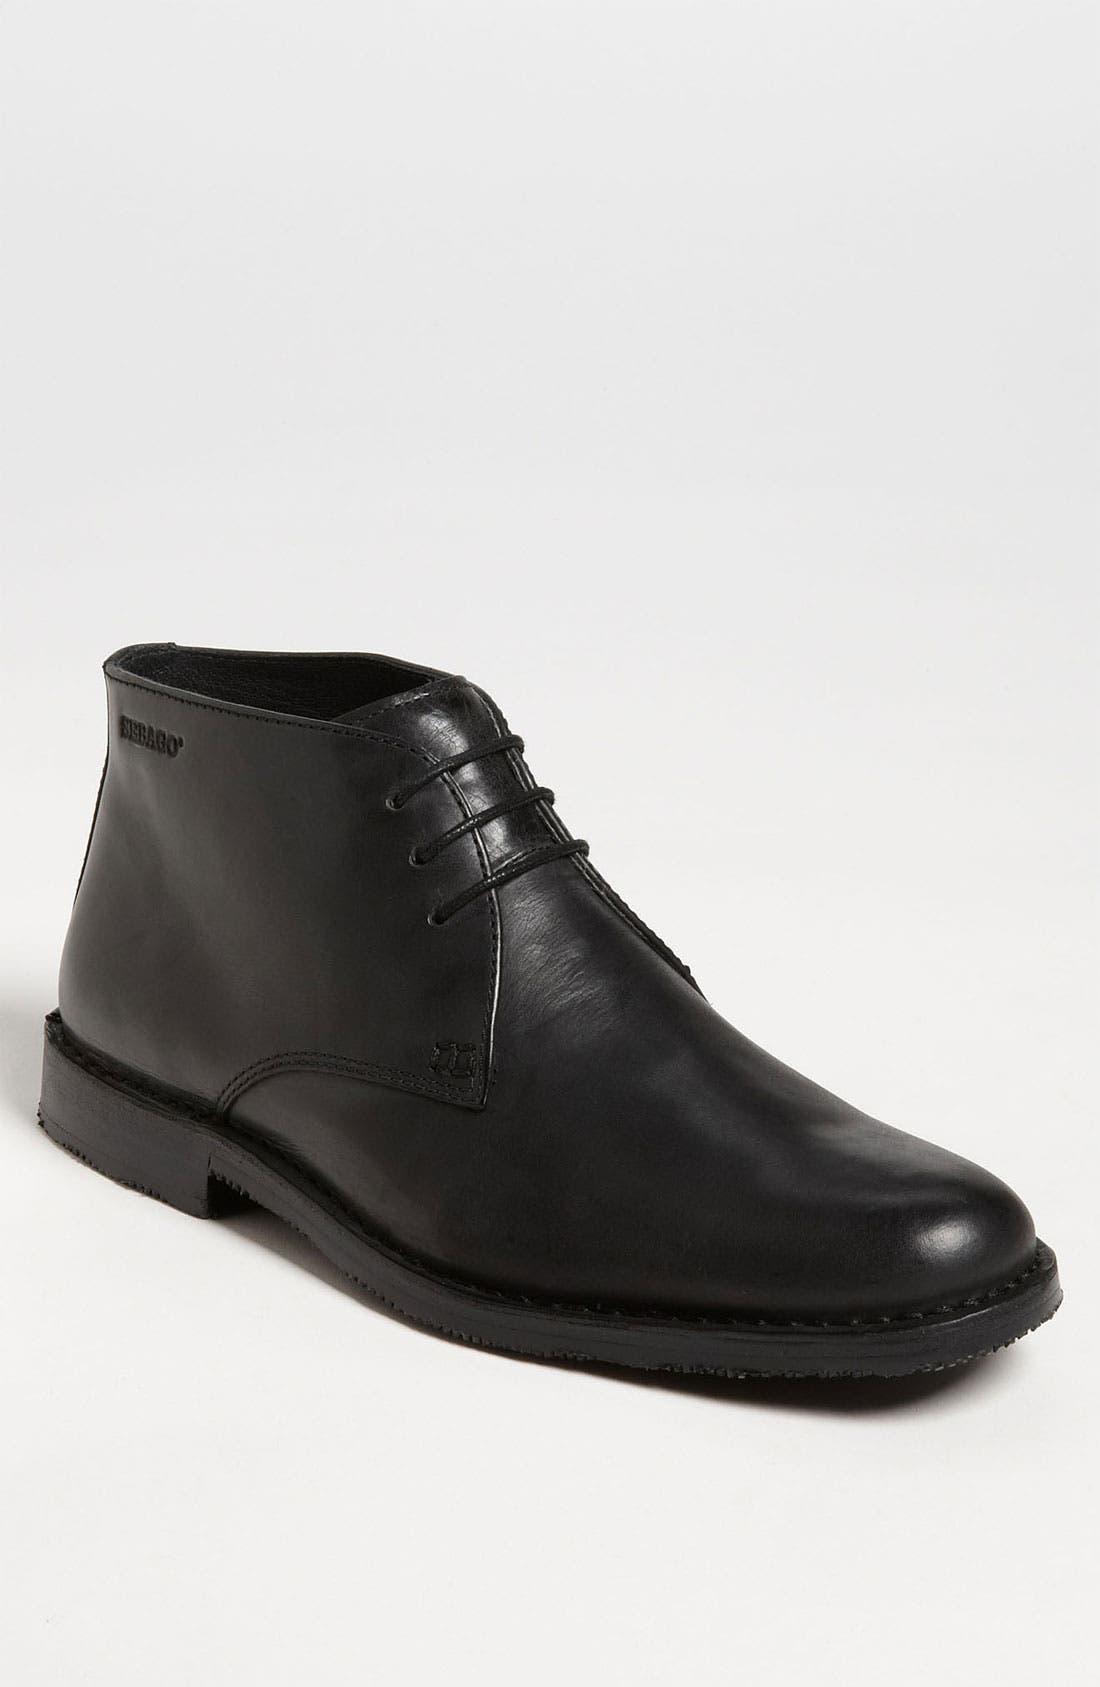 Main Image - Sebago 'Tremont' Chukka Boot